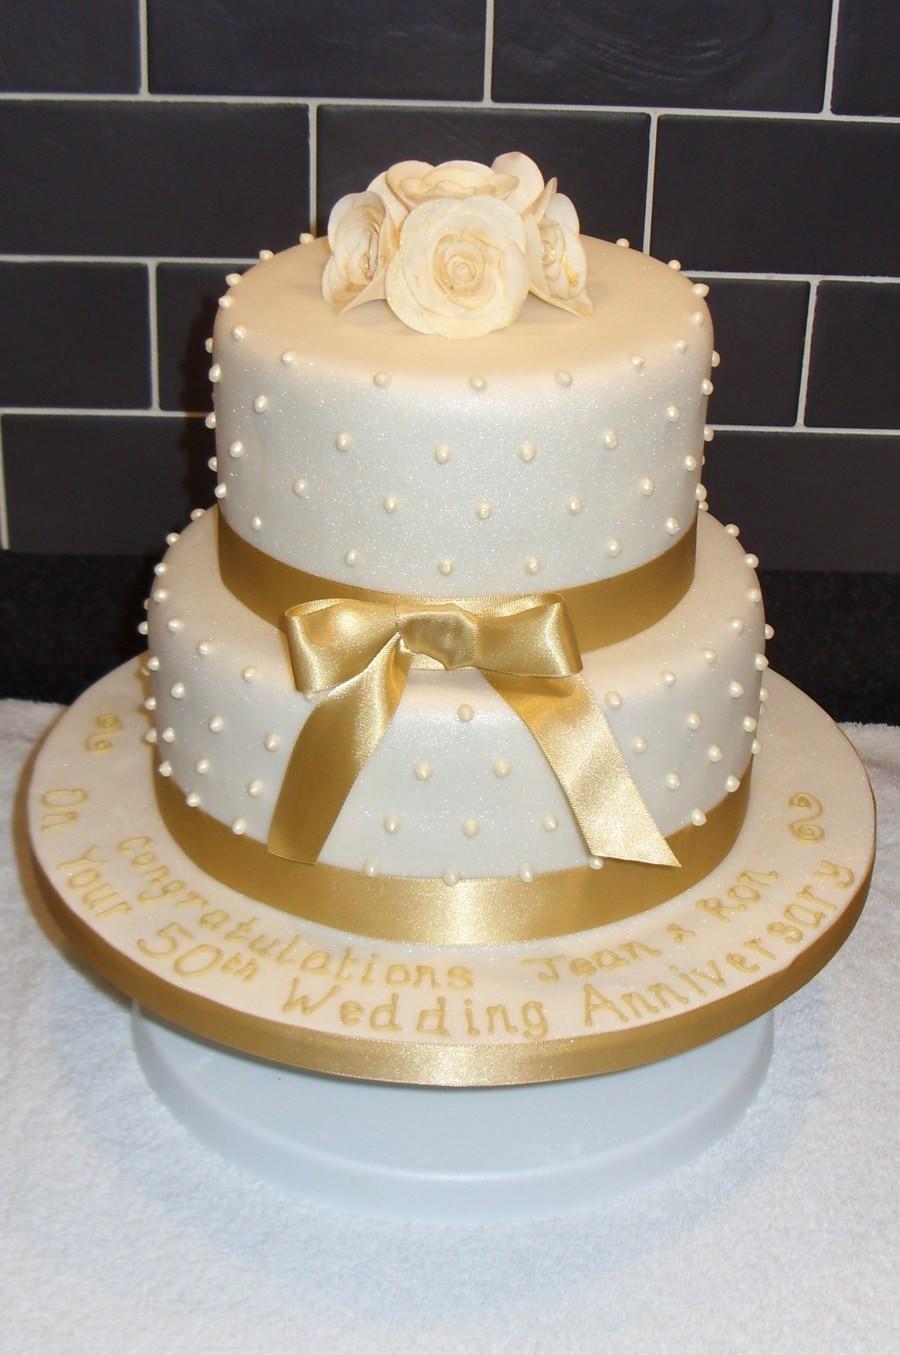 Wedding Birthday Cake  Golden Wedding Anniversary Cake CakeCentral